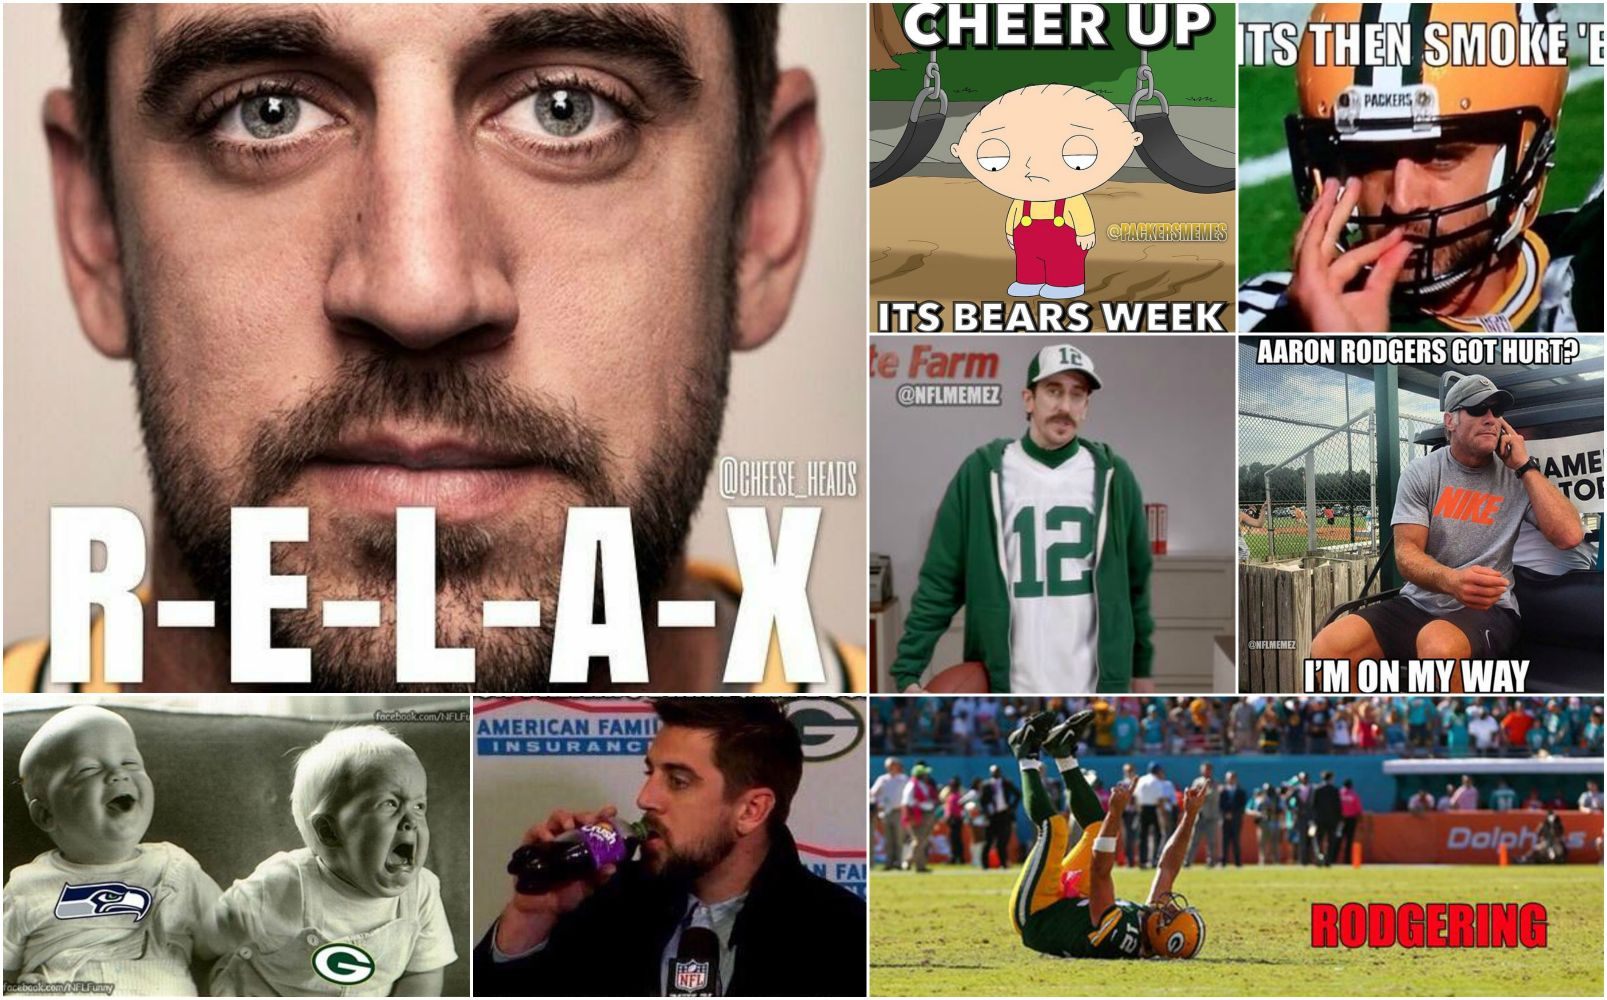 54b442a6dda65.image?resize=1200%2C747 recap the packers' 2014 season in internet memes pro football